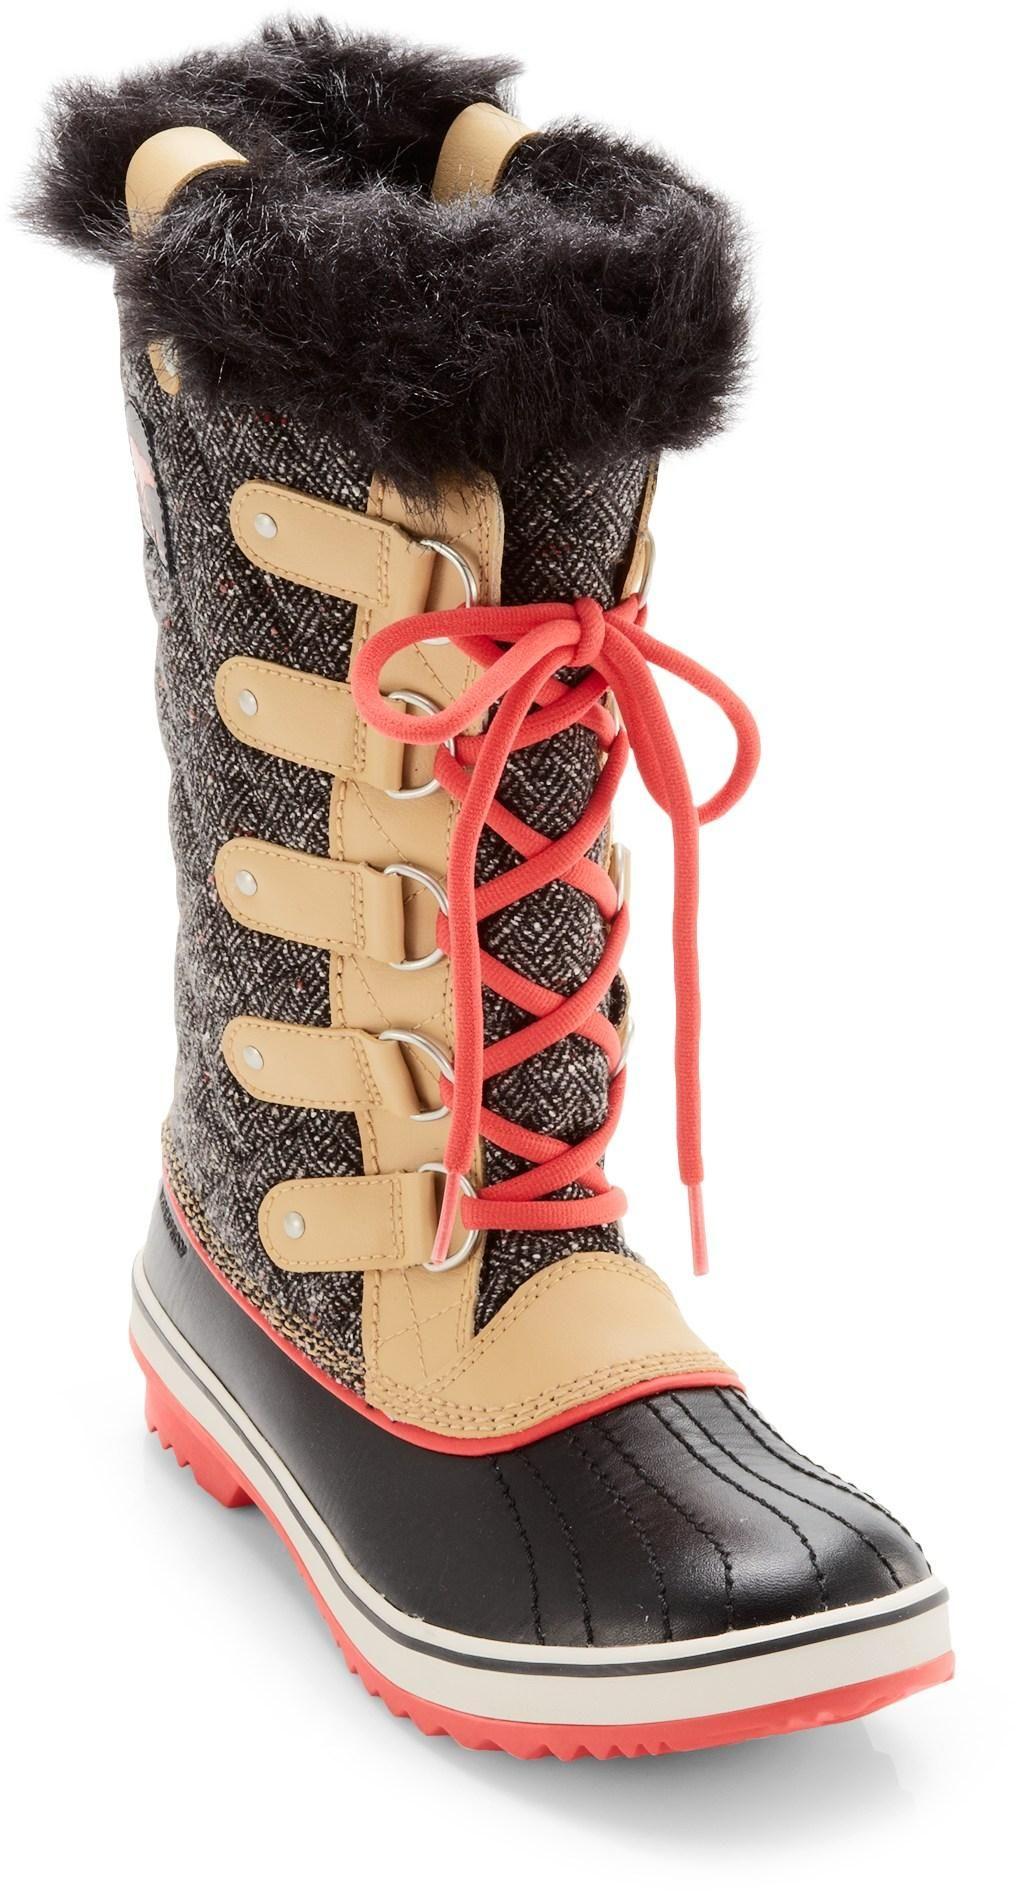 Sorel Tofino Herringbone Winter Boots Women S Rei Co Op Winter Boots Women Sorel Boots Womens Boots